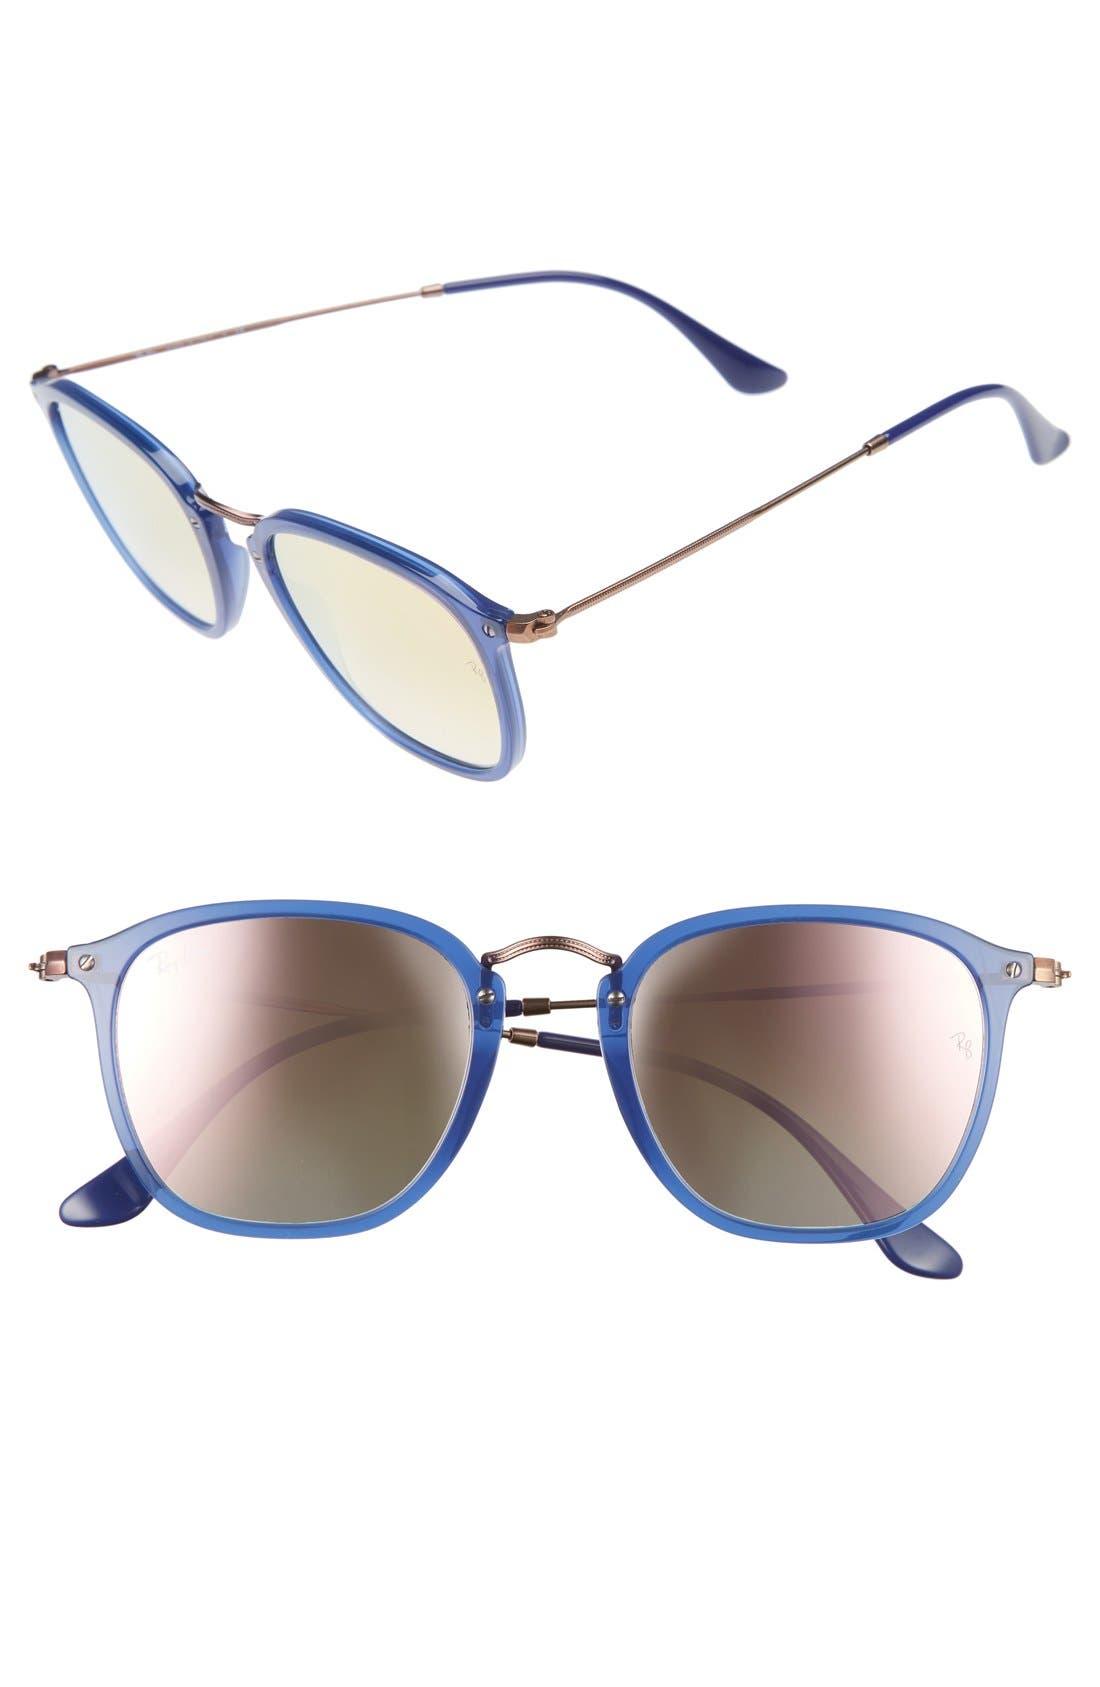 Main Image - Ray-Ban Icons Wayfarer 51mm Sunglasses